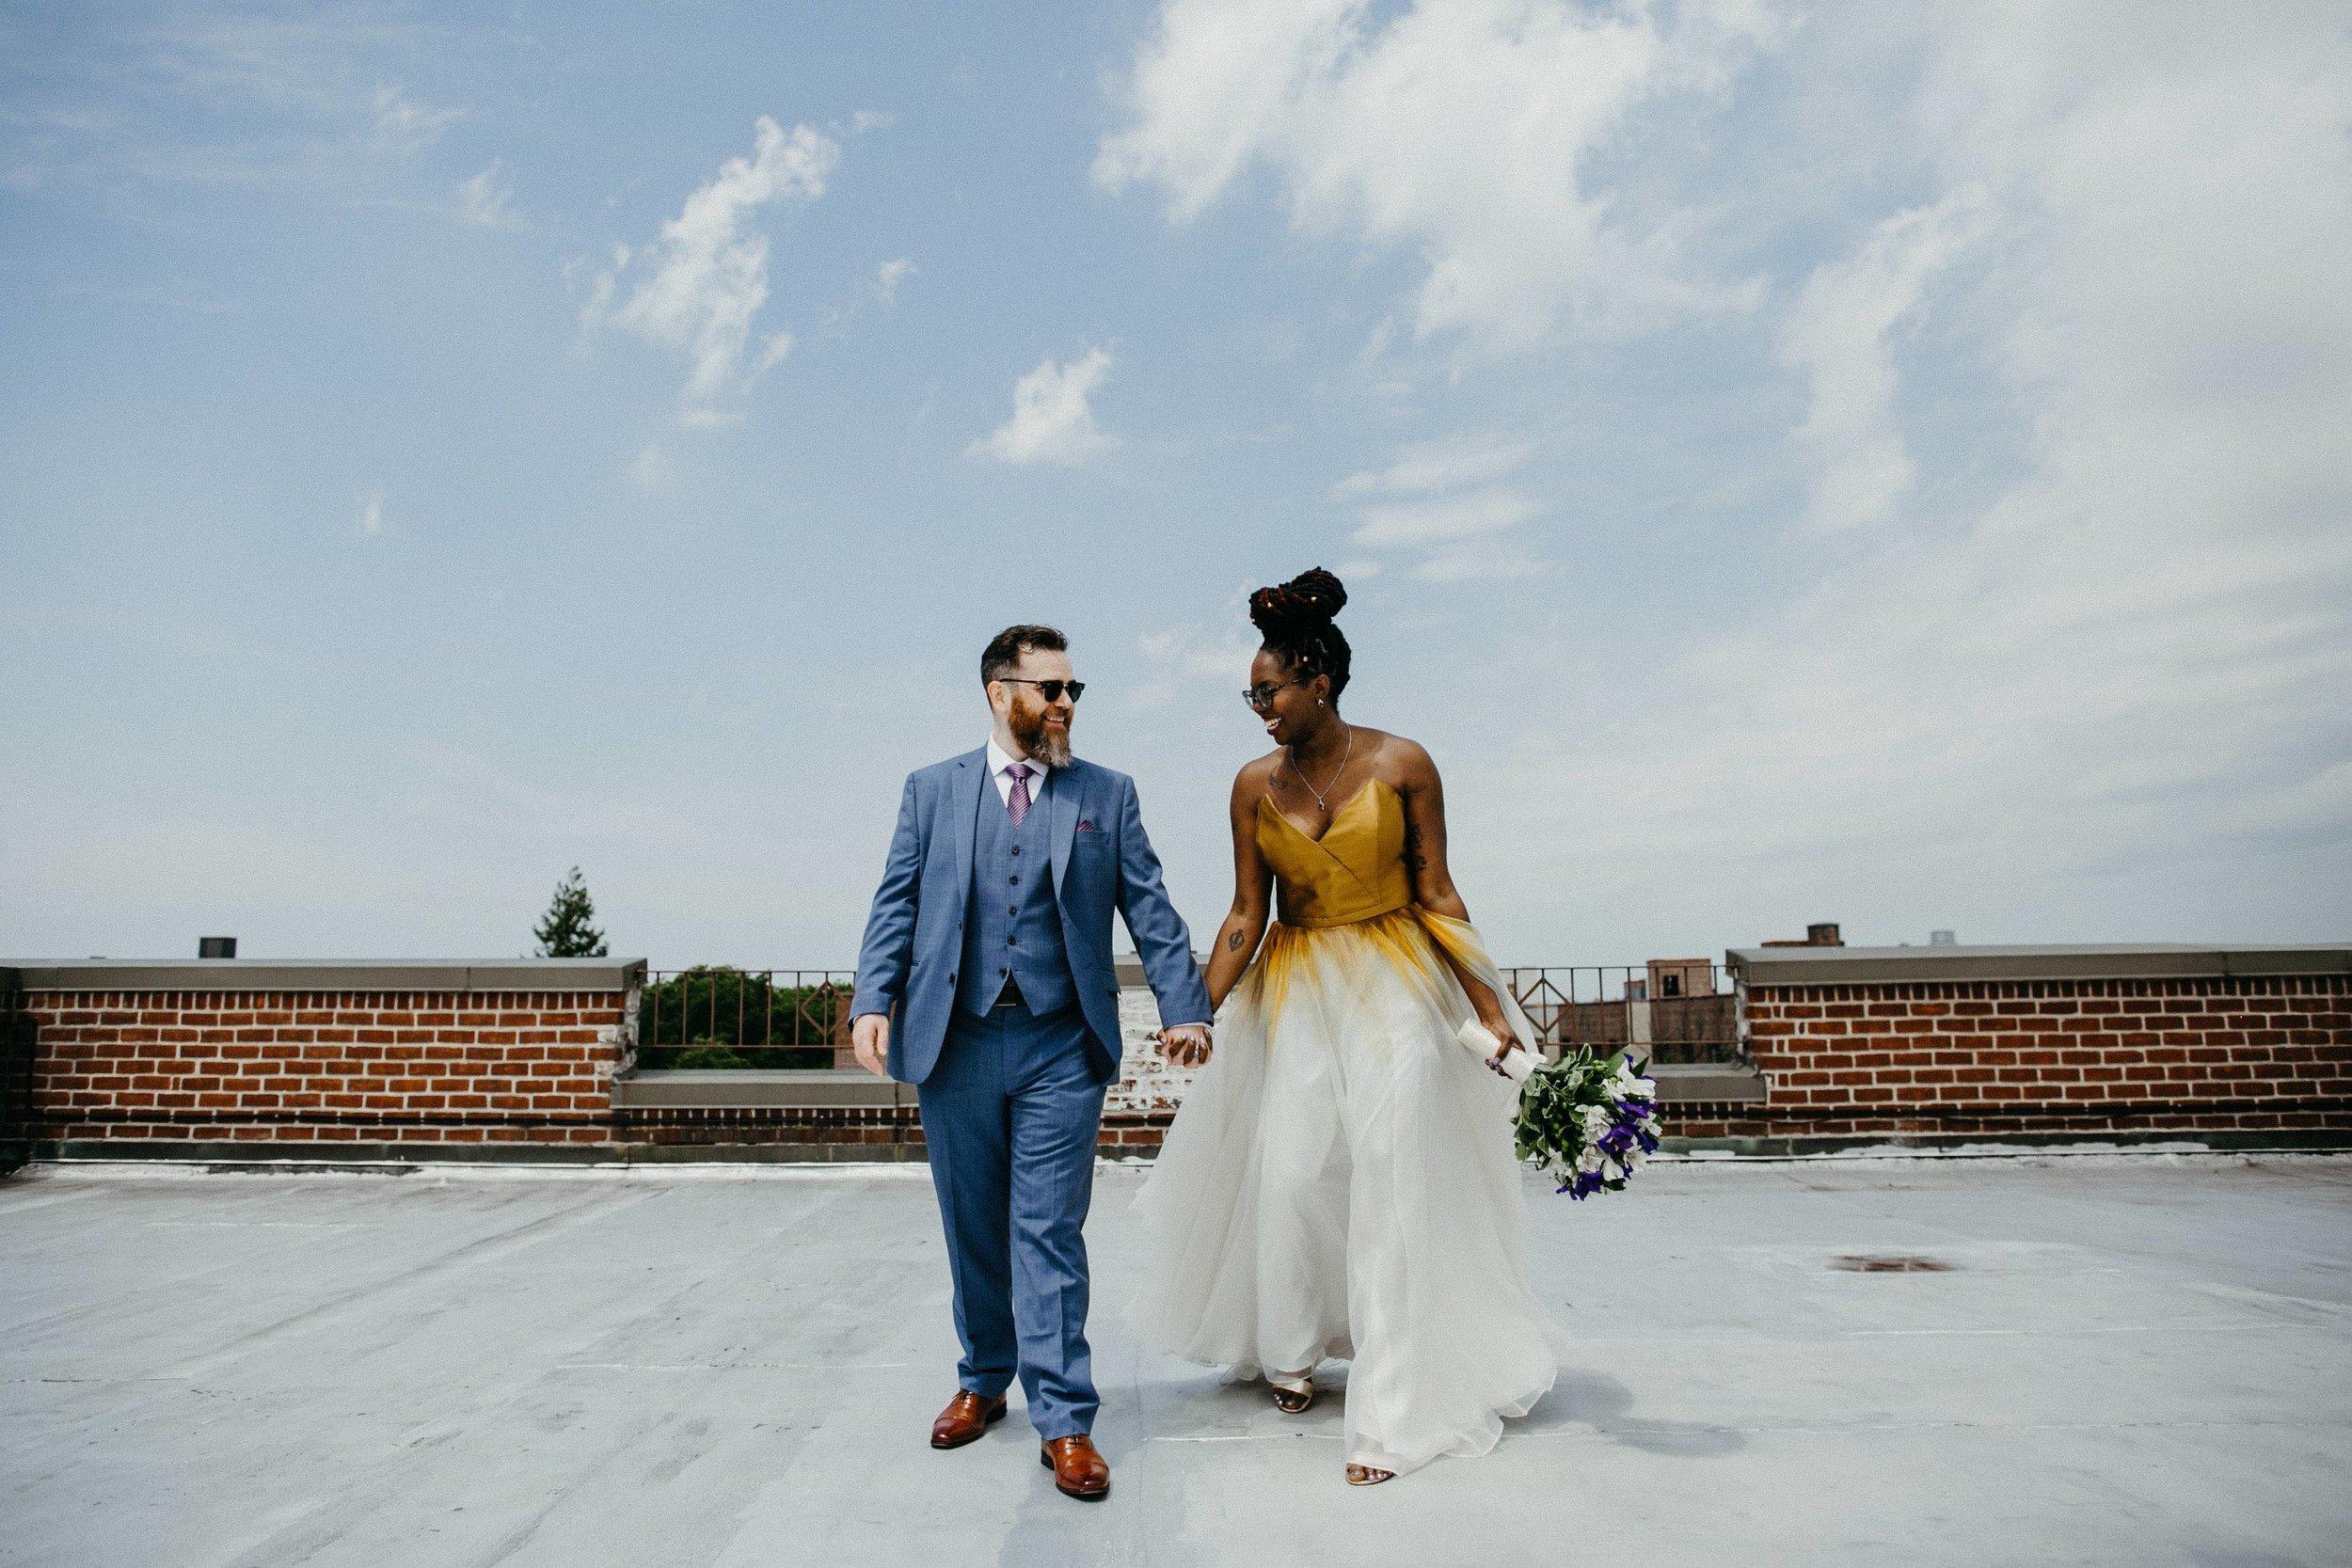 Sevlynn-Photography-Wedding-LIC-Landing-Maiella-NYC-14.jpg